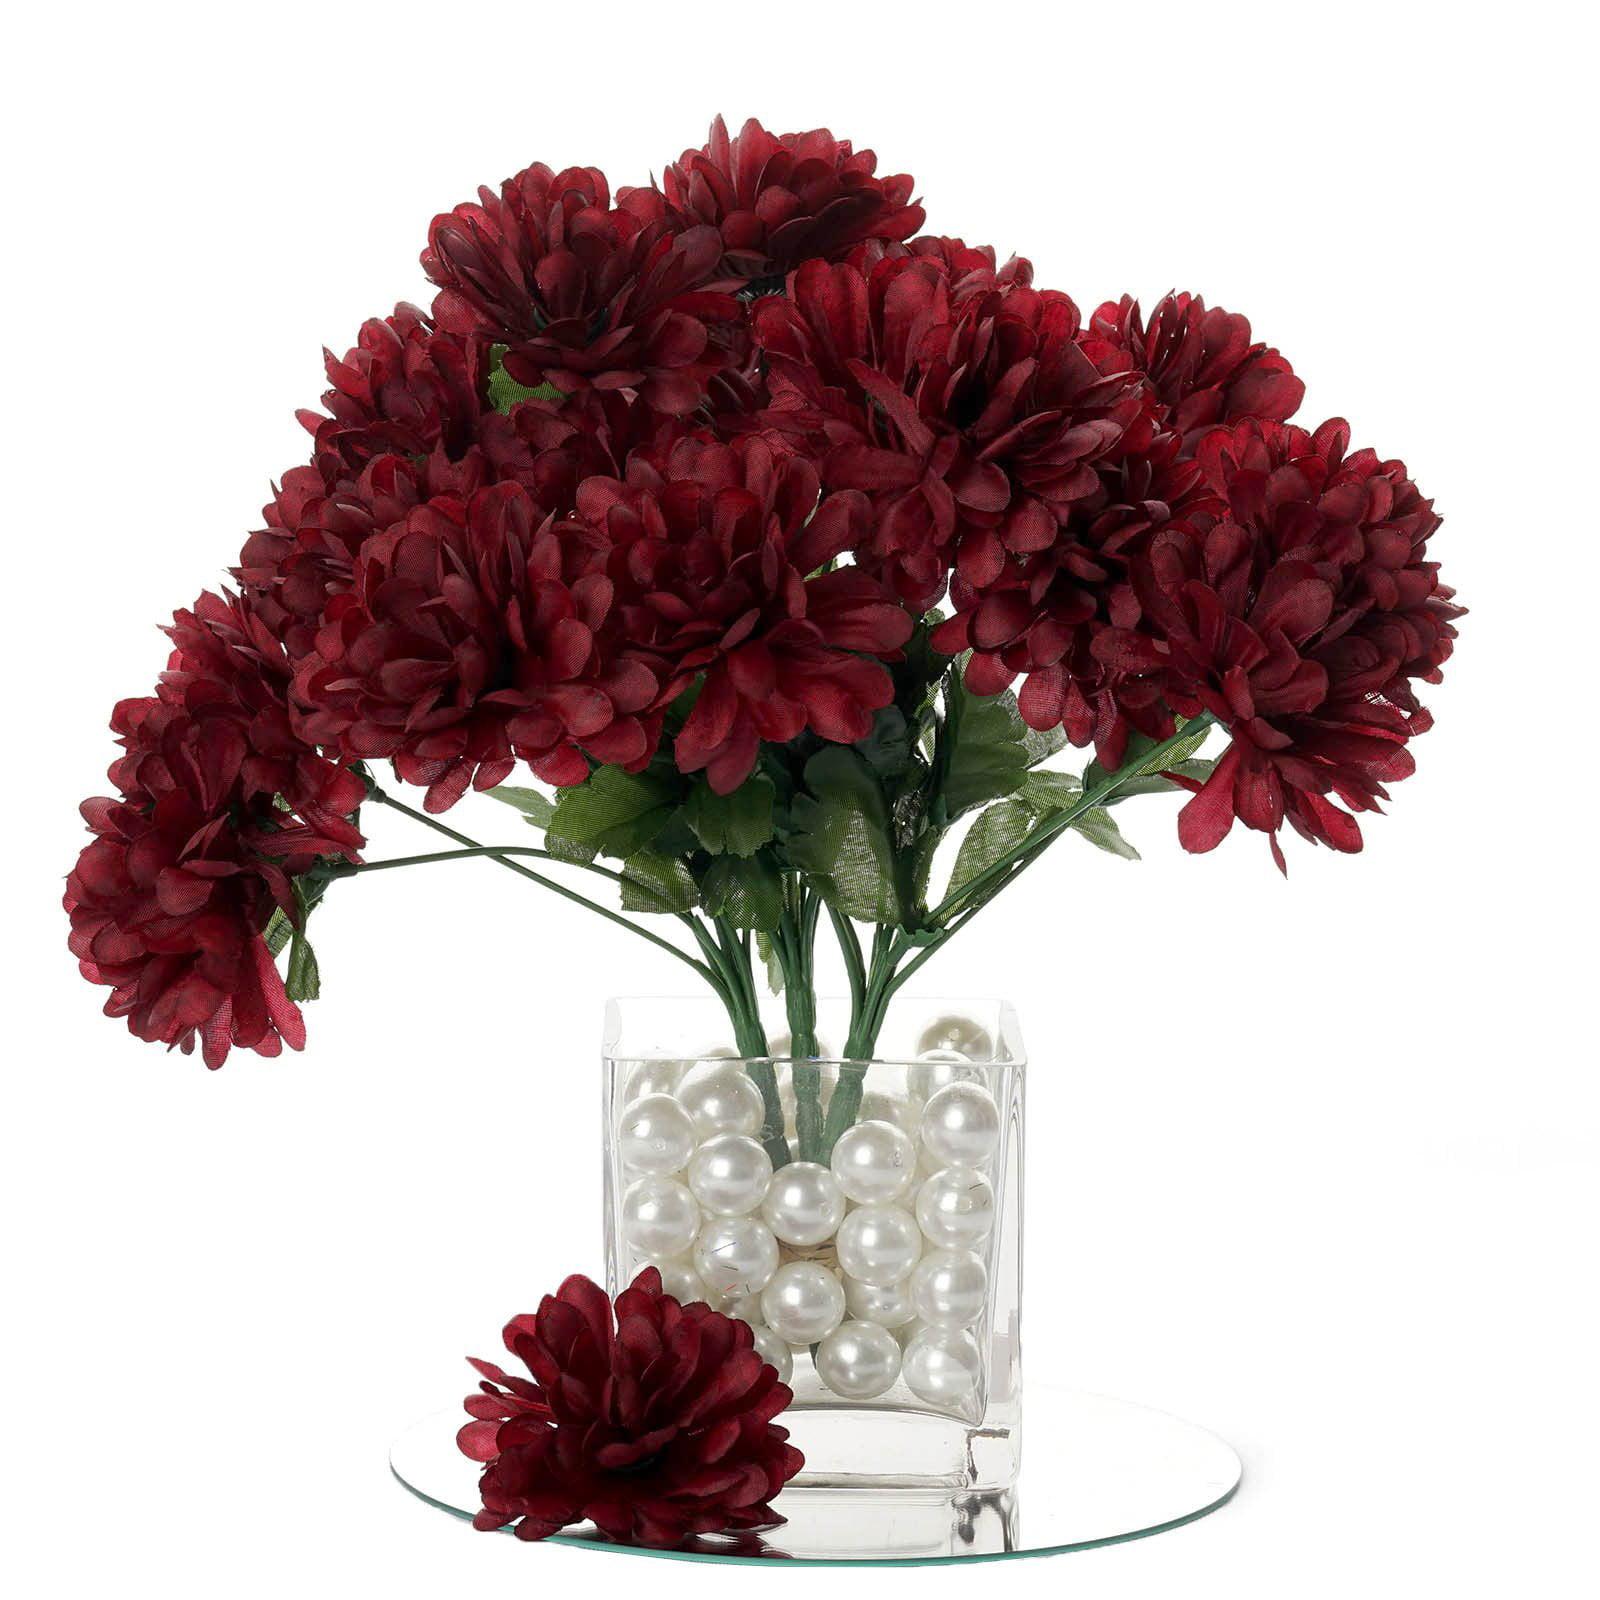 BalsaCircle 84 Chrysanthemum Mums Balls Silk Flowers - DIY Home Wedding Party Artificial Bouquets Arrangements Centerpieces